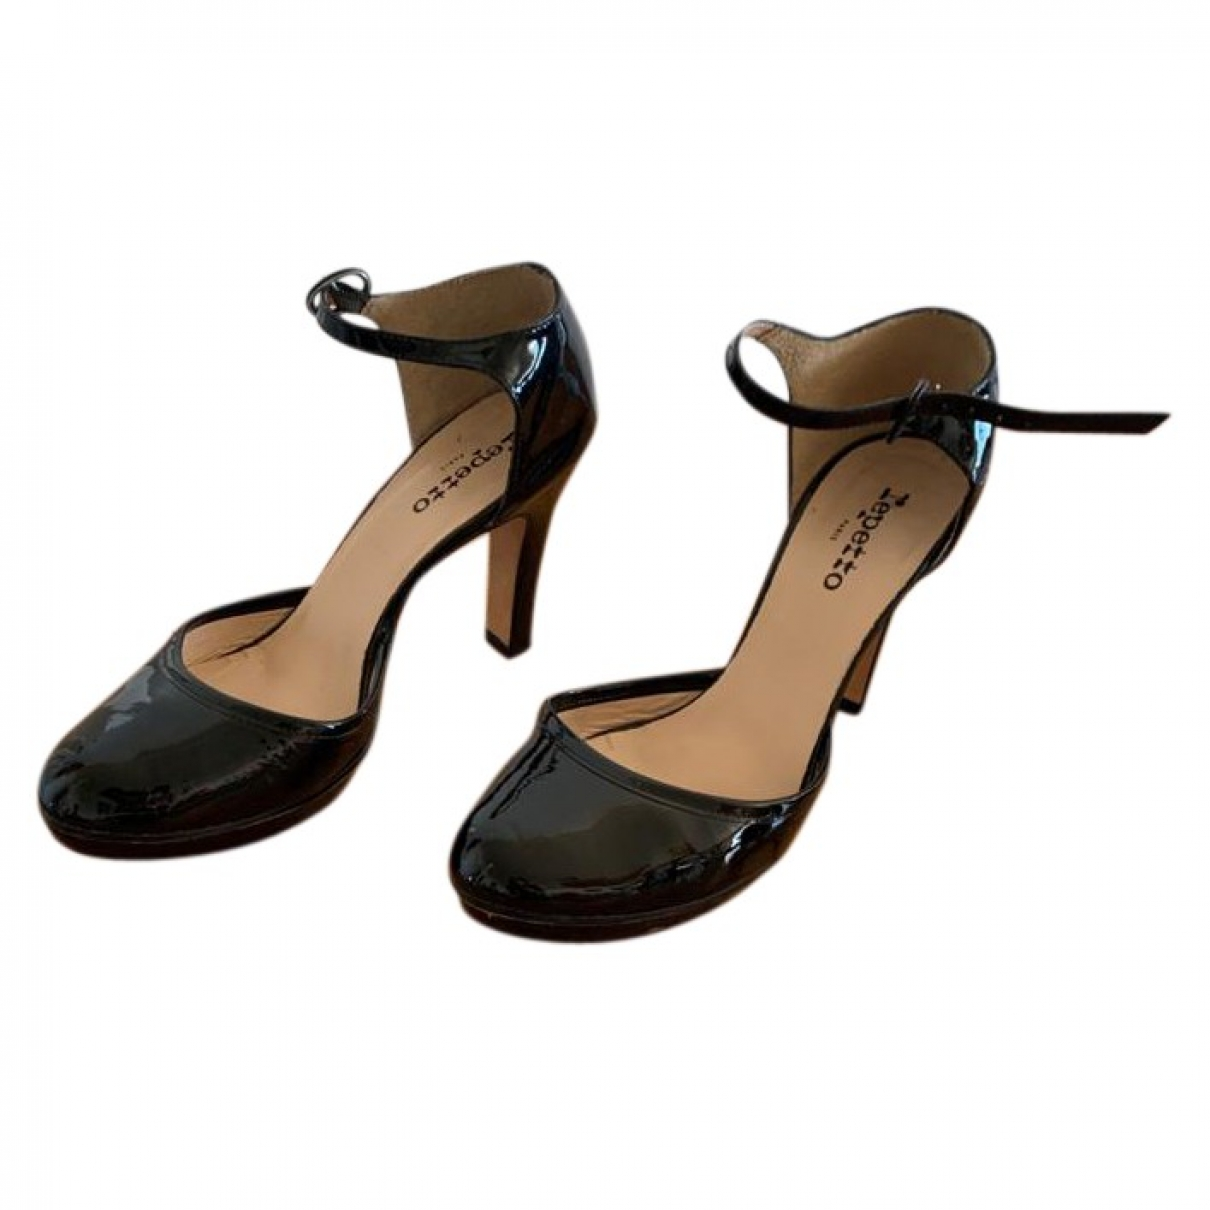 Repetto \N Sandalen in  Schwarz Lackleder